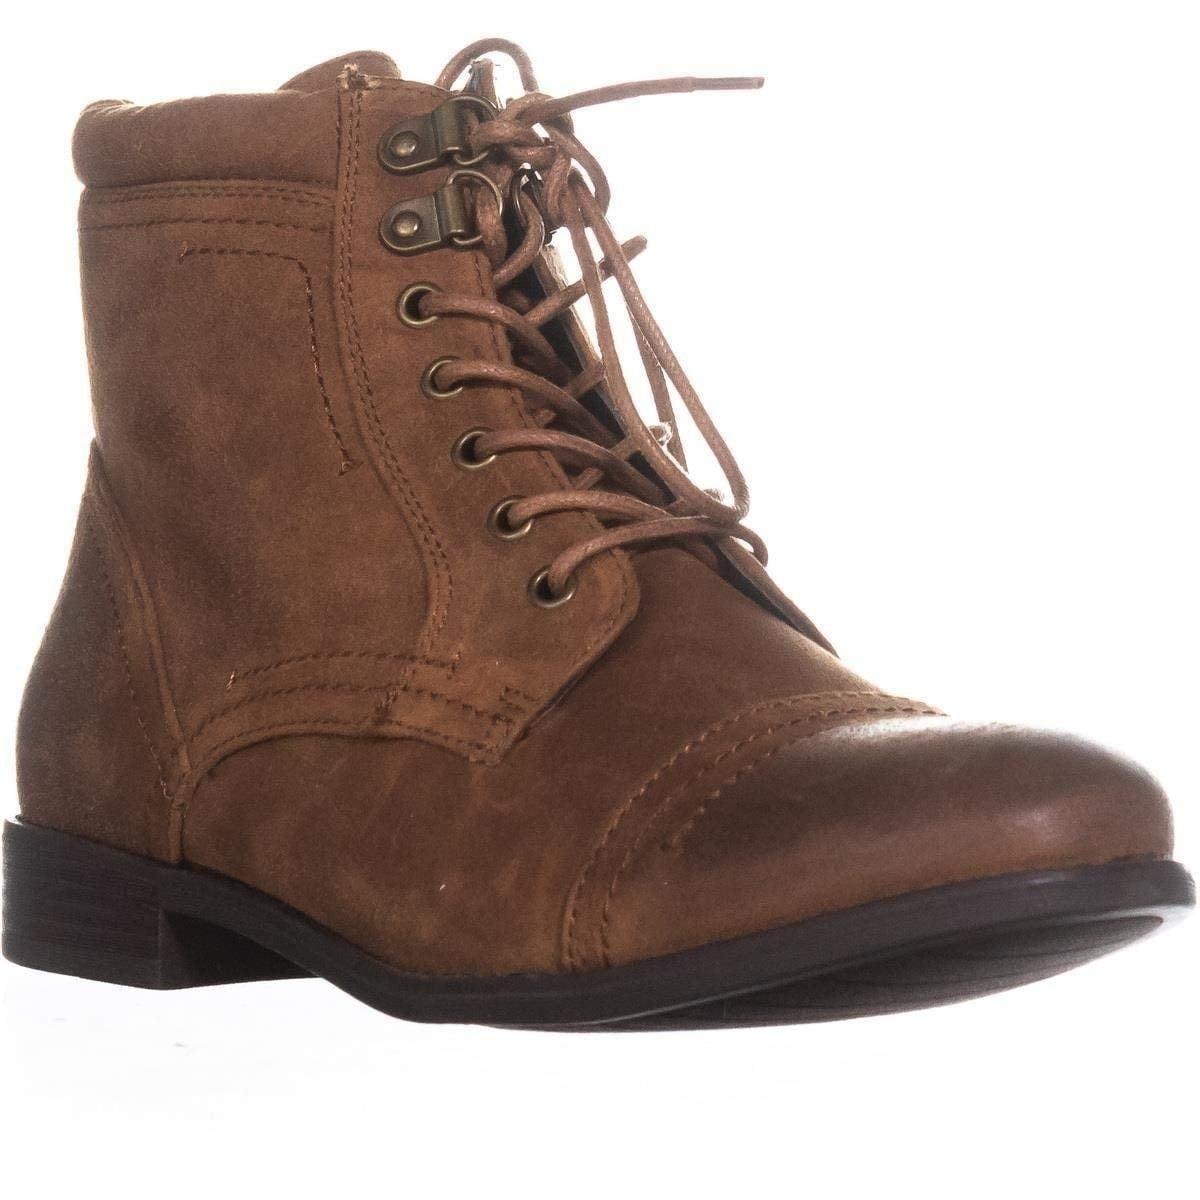 d0a5121fd276 Buy Women's Boots Online at Overstock | Our Best Women's Shoes Deals